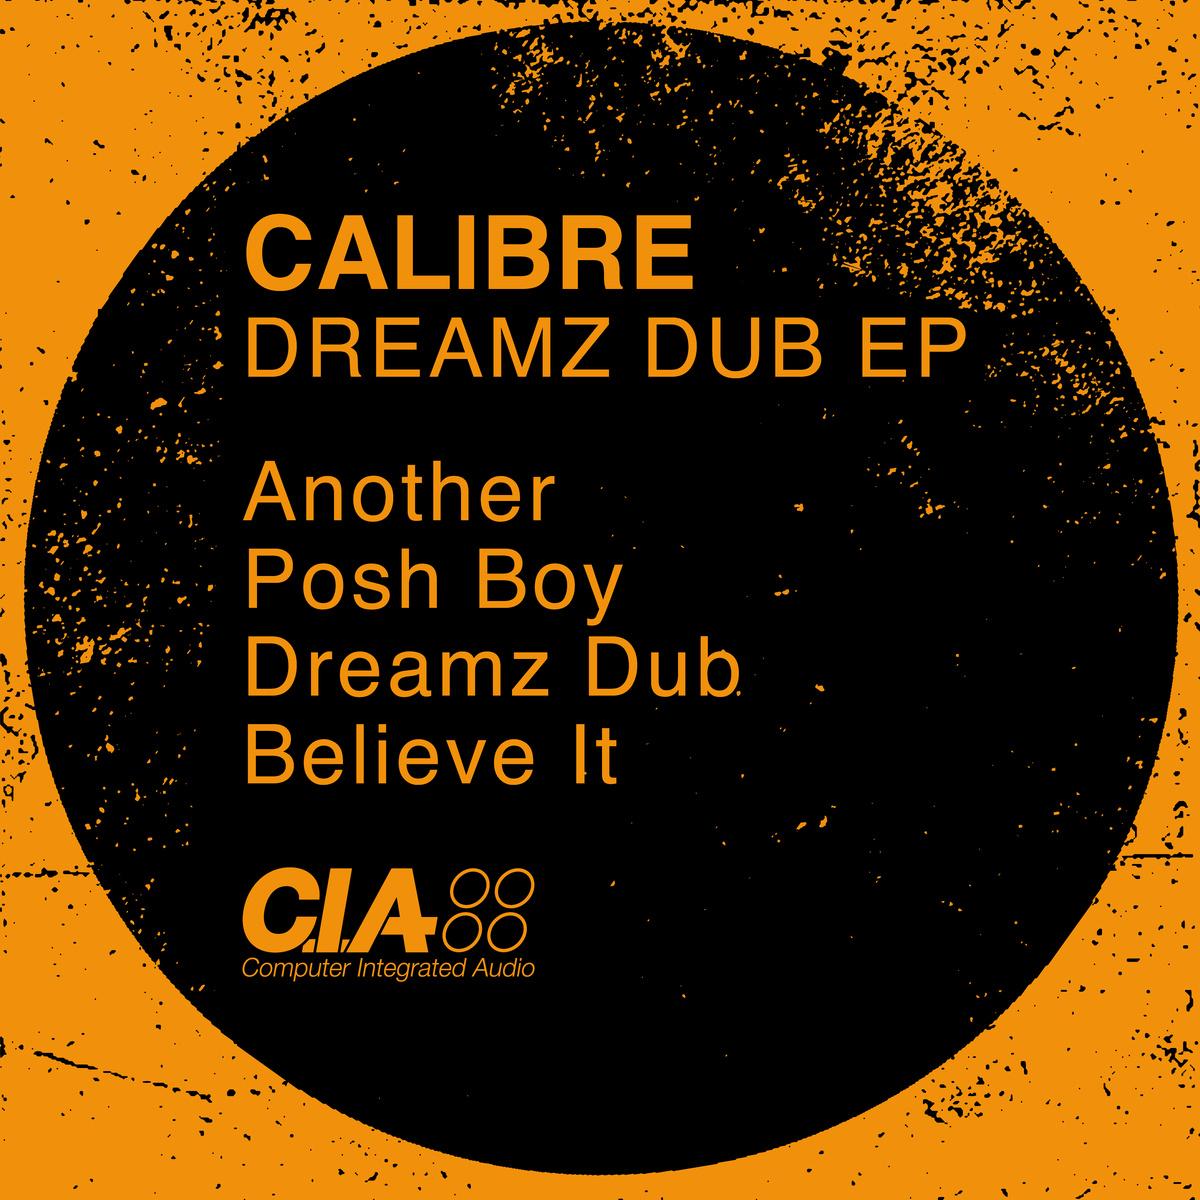 Calibre - Dreamz Dub EP